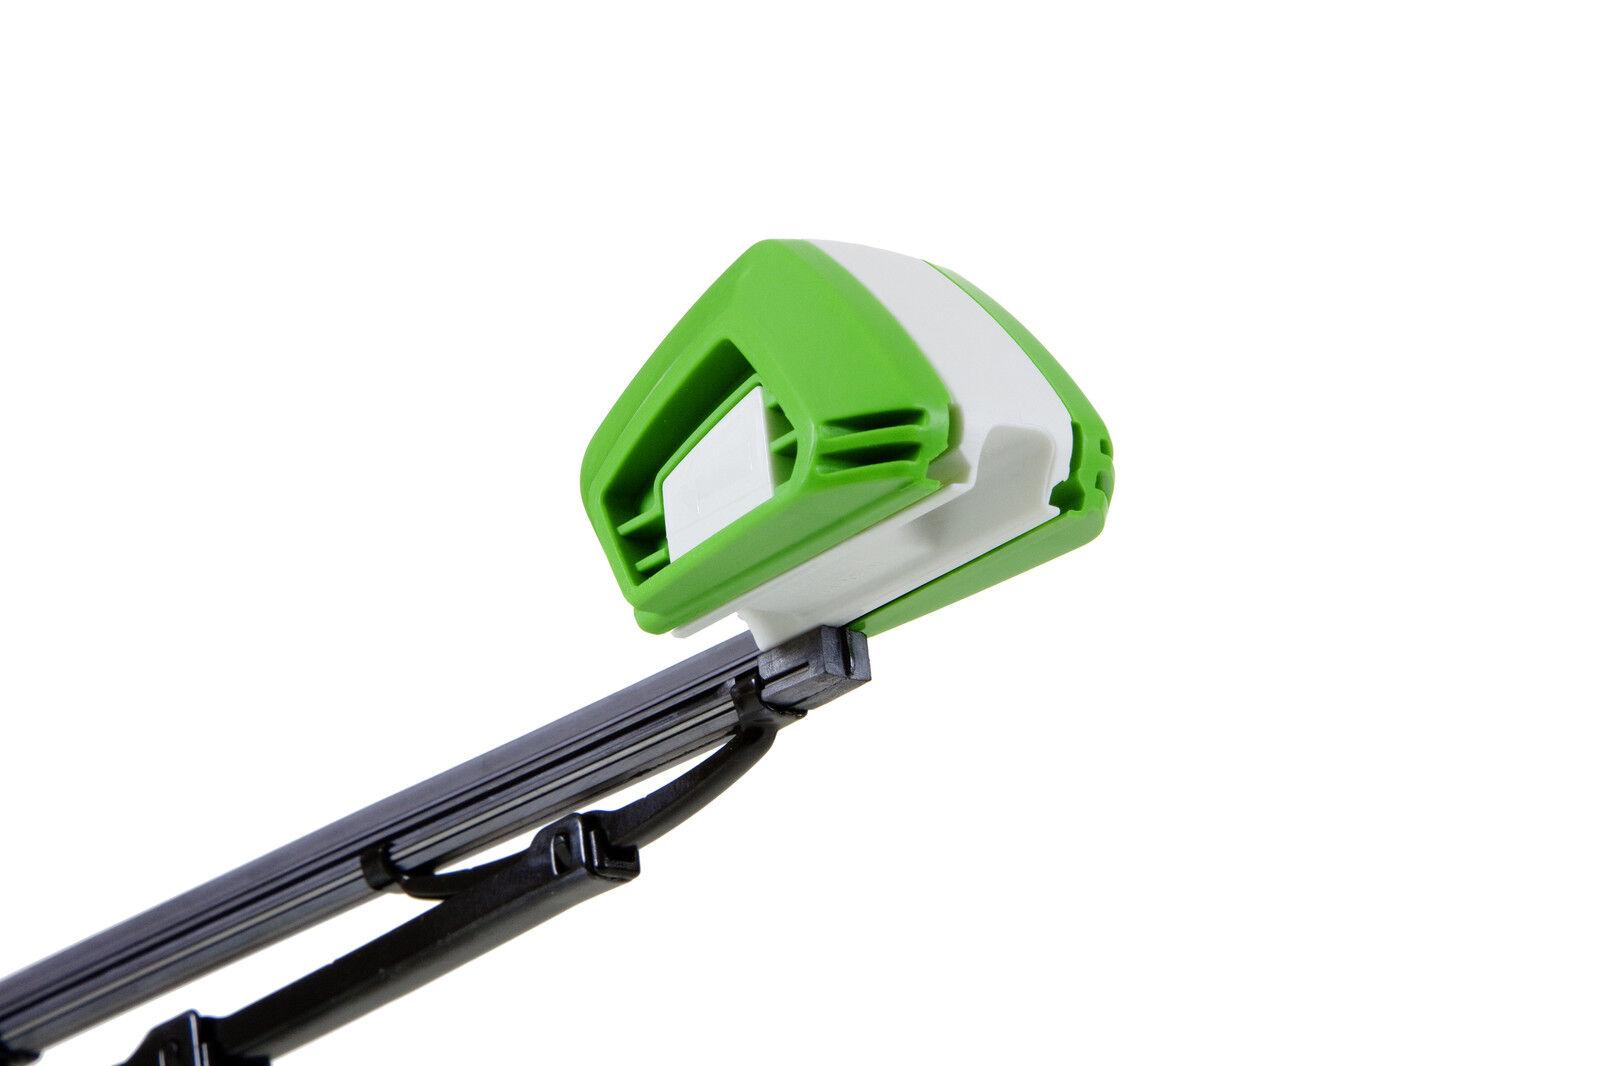 ecocut pro windshield wiper trimmer directly from manufacturer new for sale in rastatt. Black Bedroom Furniture Sets. Home Design Ideas